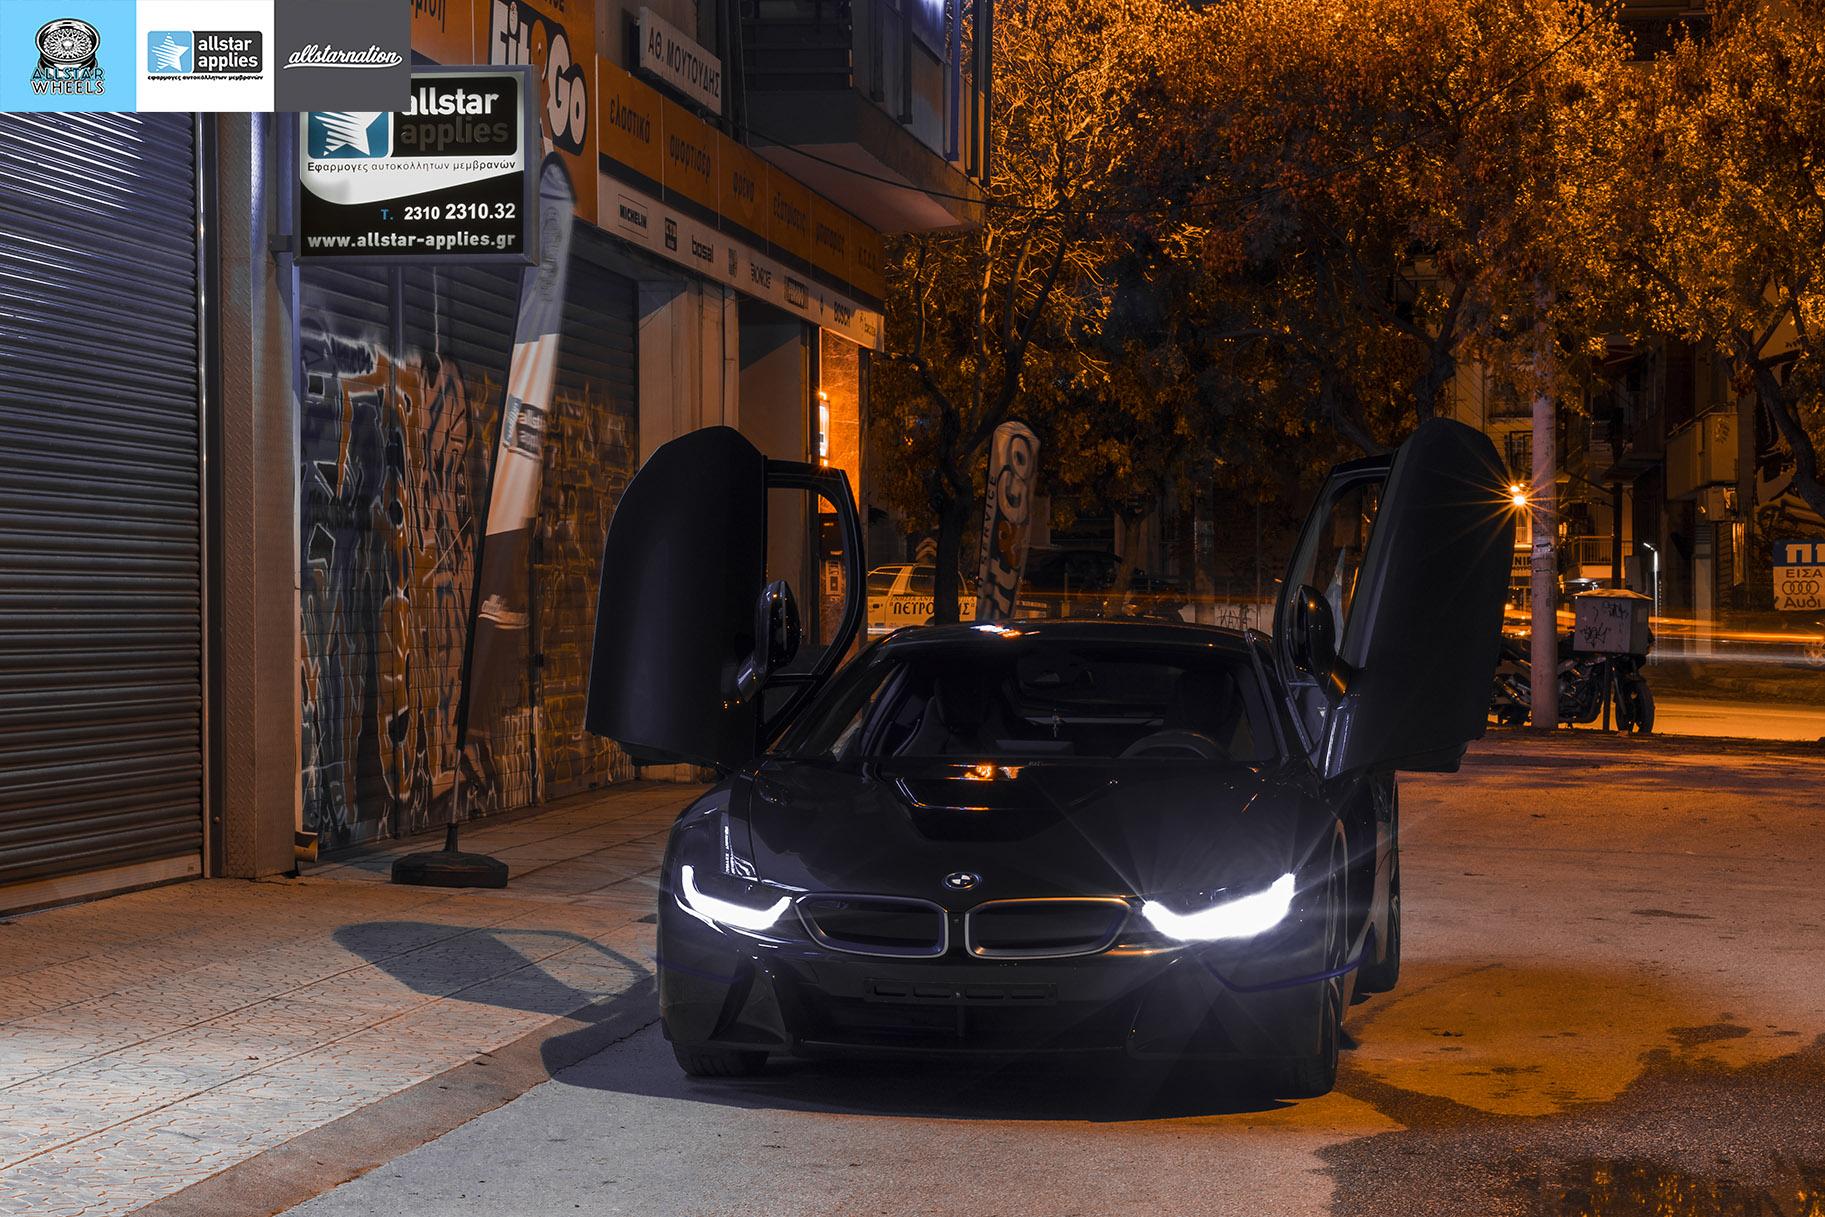 BMW I8 – Μεμβράνες προστασίας χρώματος – Μπροστινό πακέτο (8)